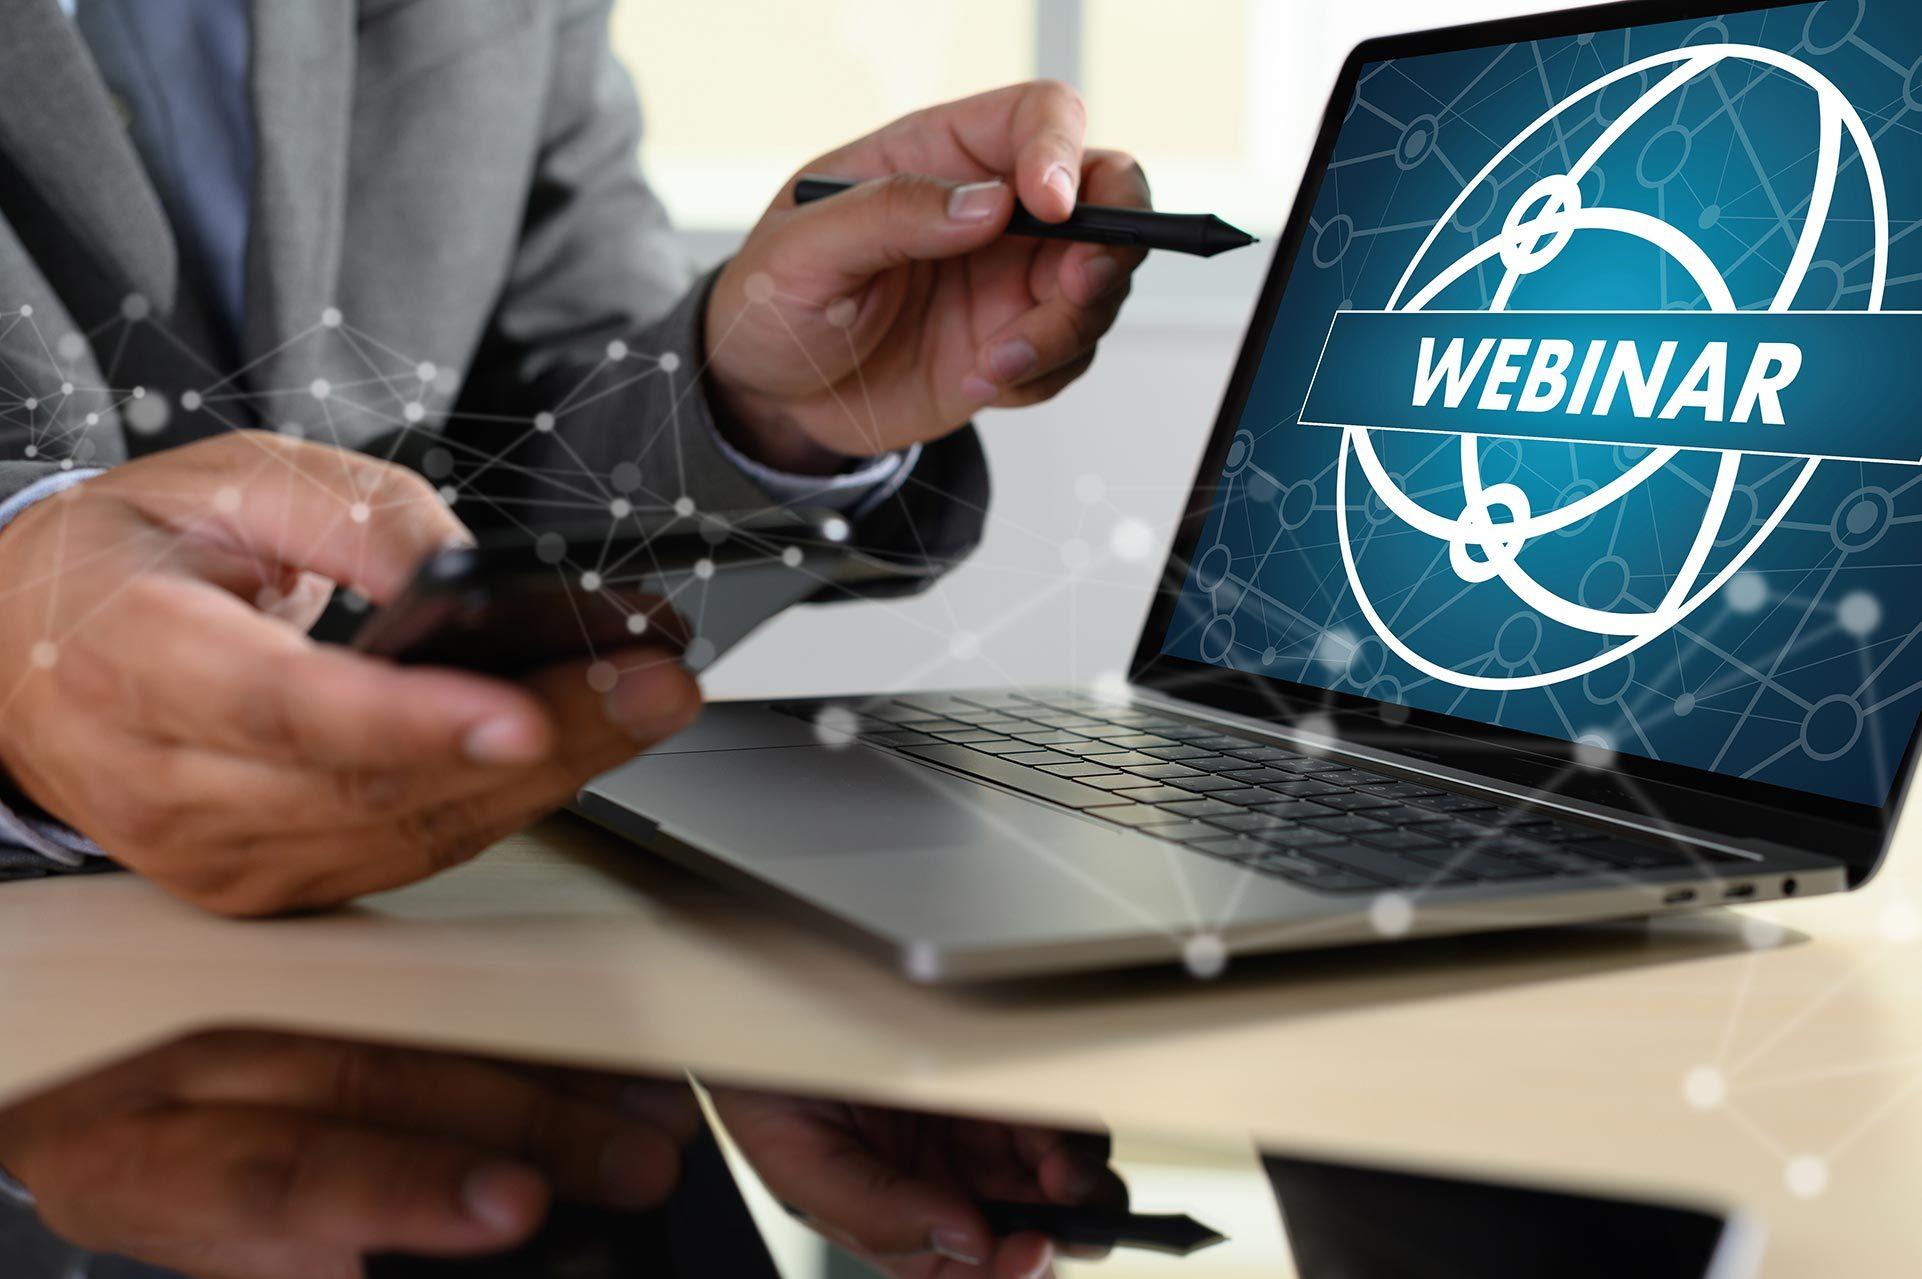 What we do webinar 2